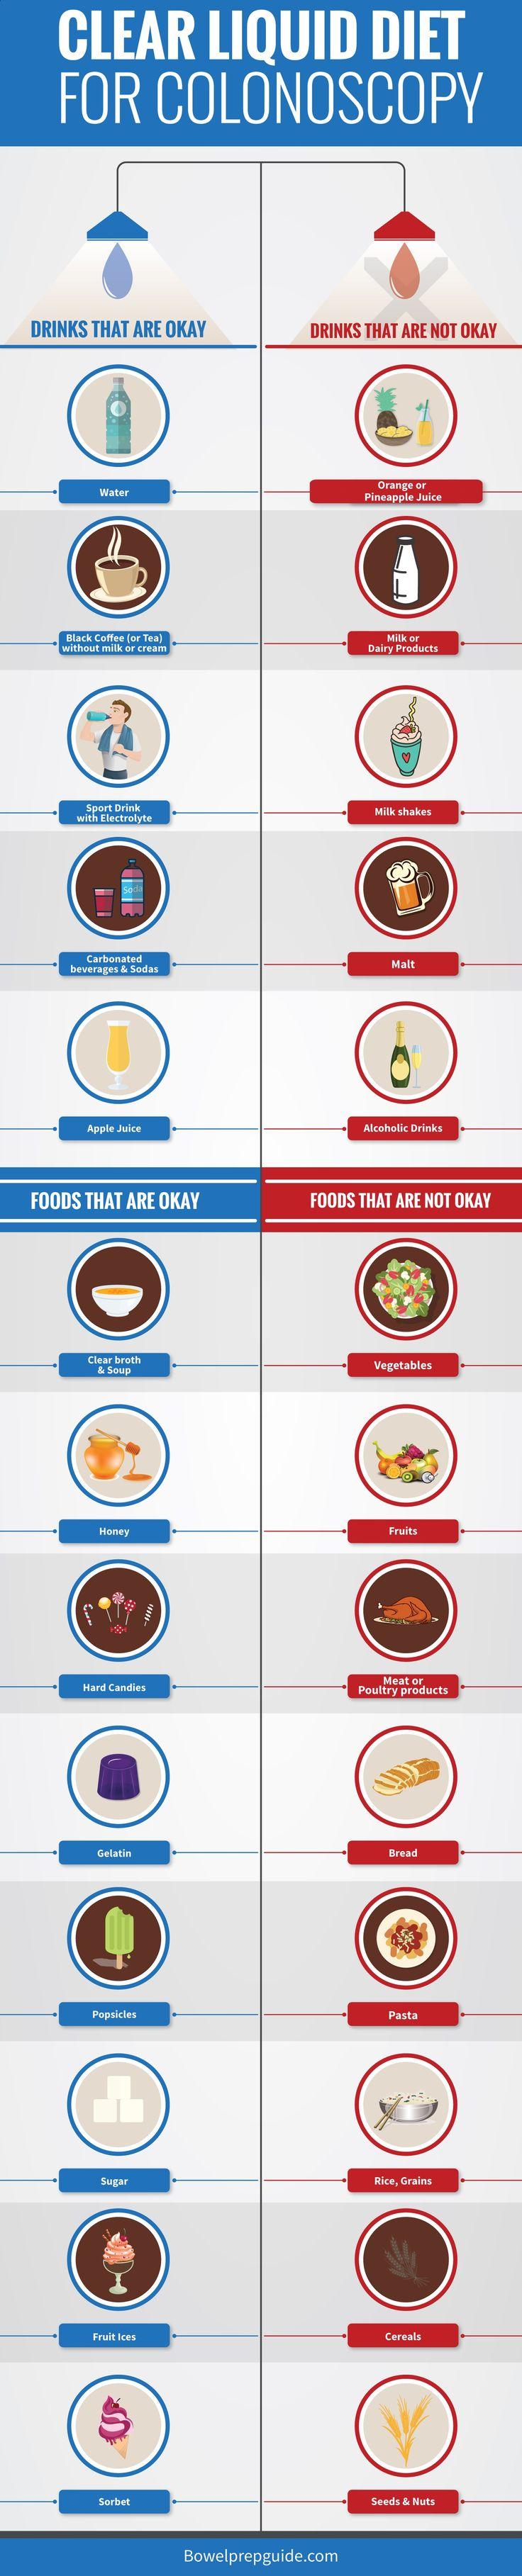 Liquid diet foods for colonoscopy